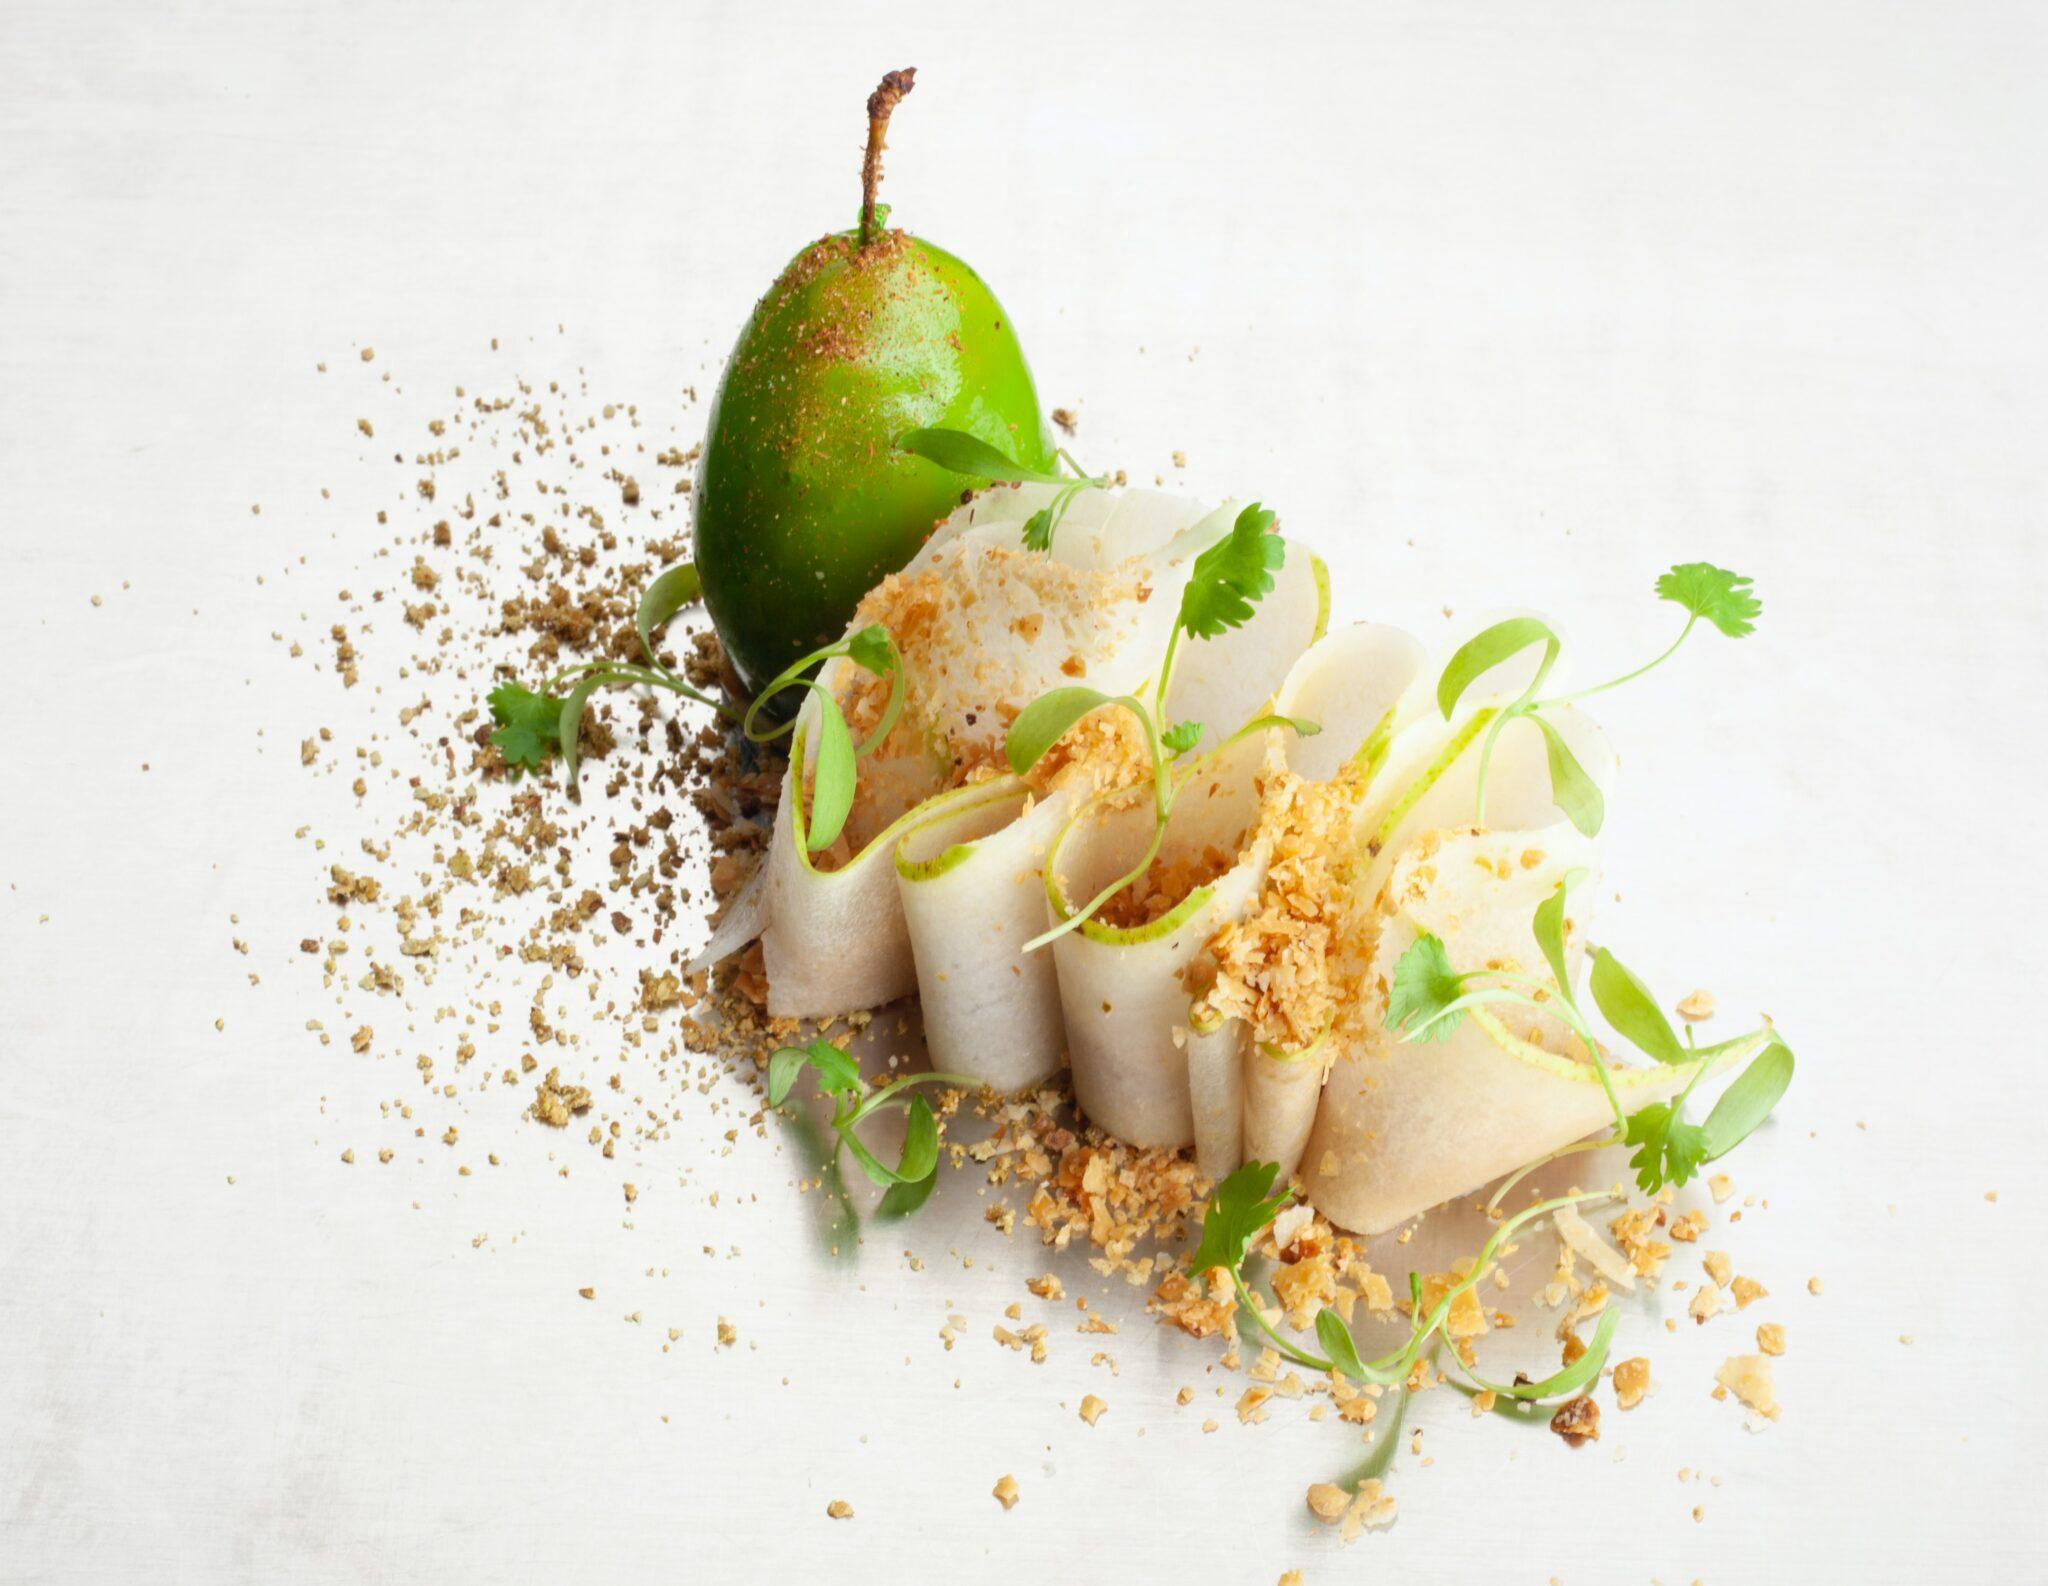 Beautiful presentation fine dining Michelin starred meal pear food porn